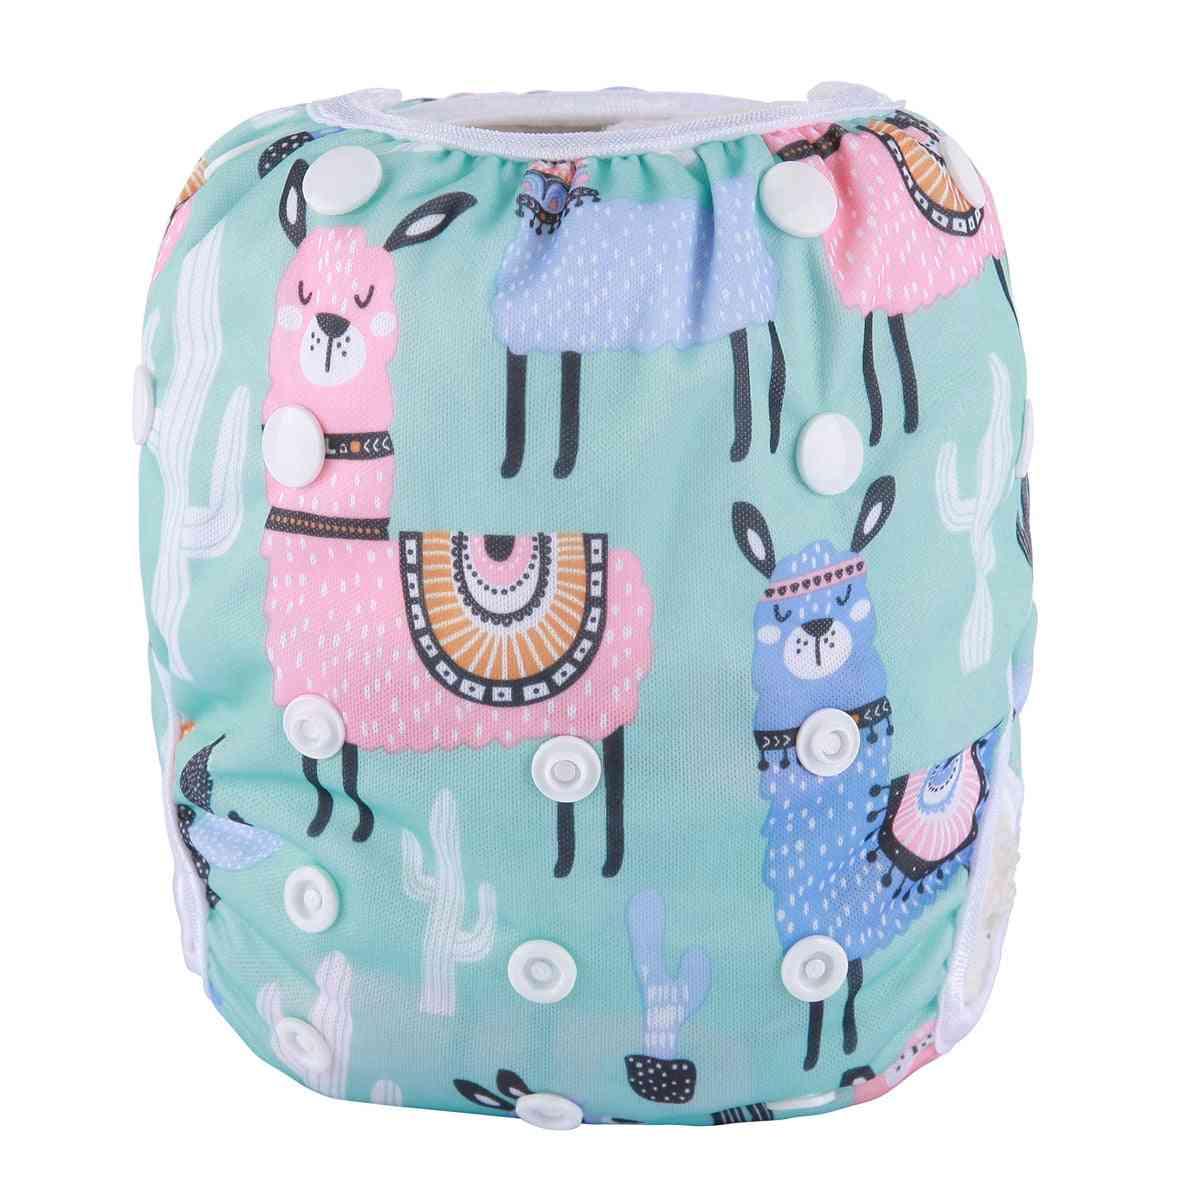 Reusable Swim Diaper Nappy Pants For Baby Infant